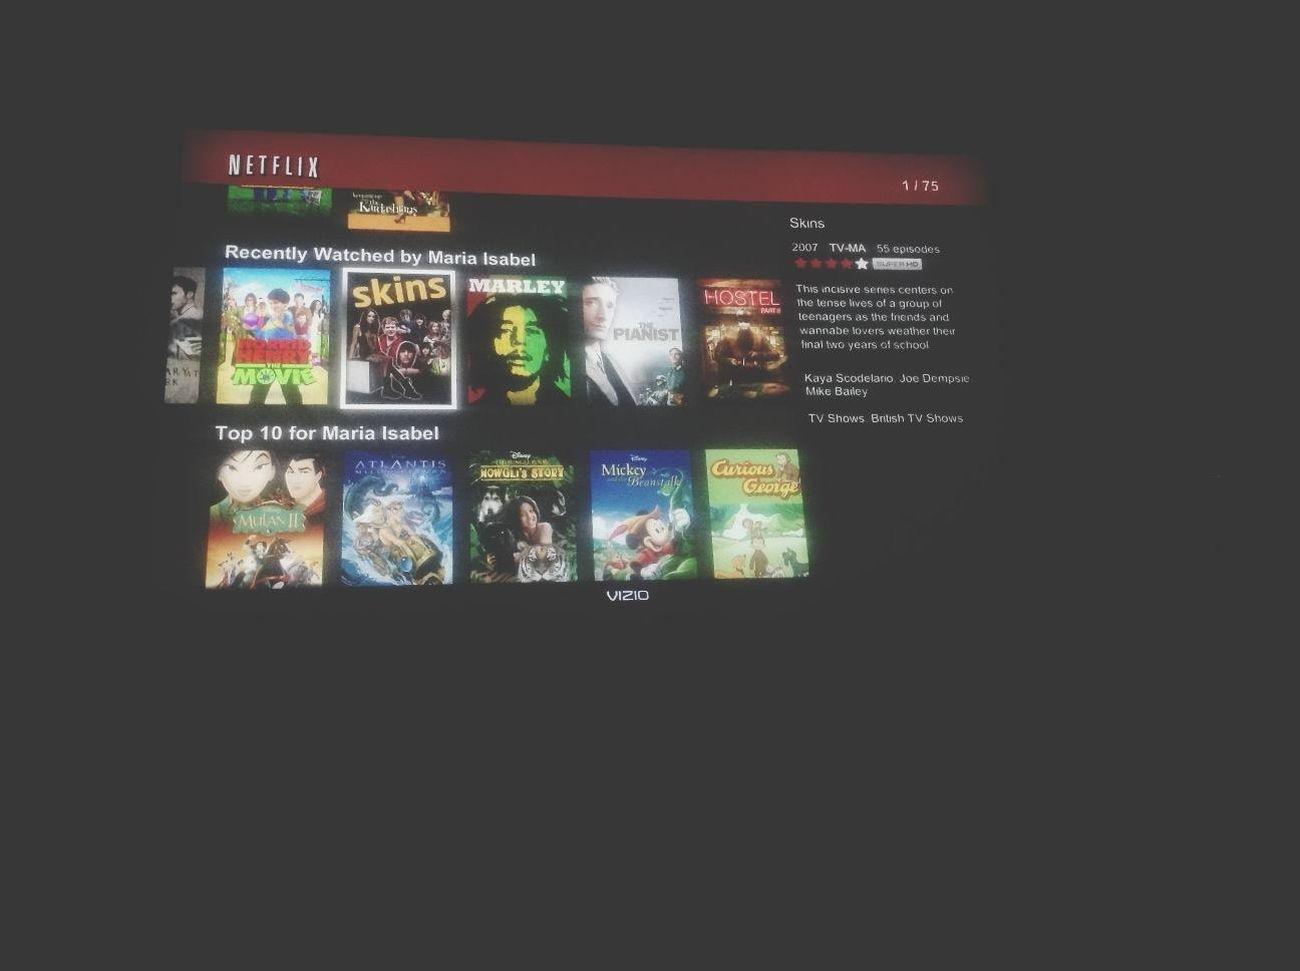 Watching Skins on Netflix